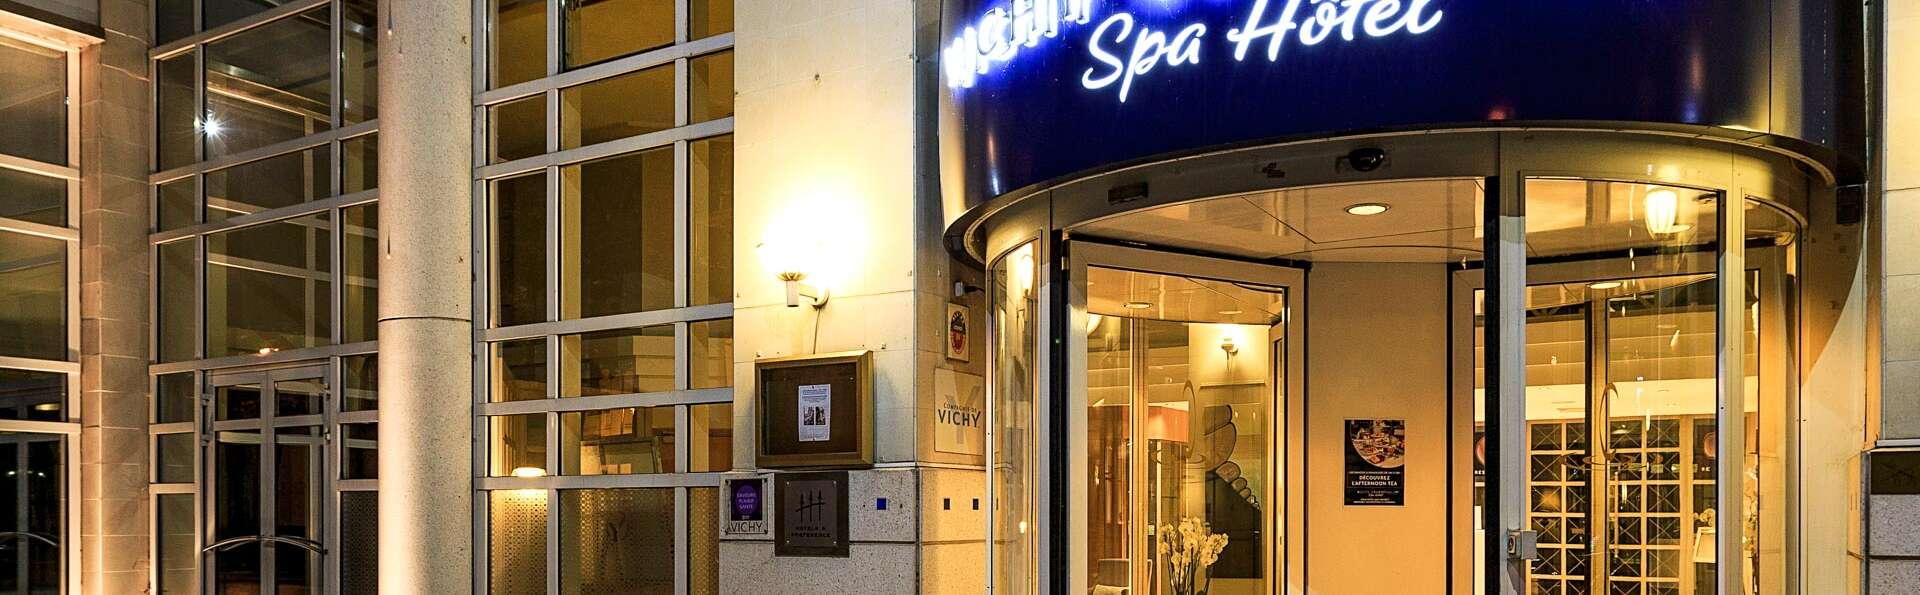 VICHY CELESTINS  Spa Hôtel - EDIT_FRONT_01.jpg